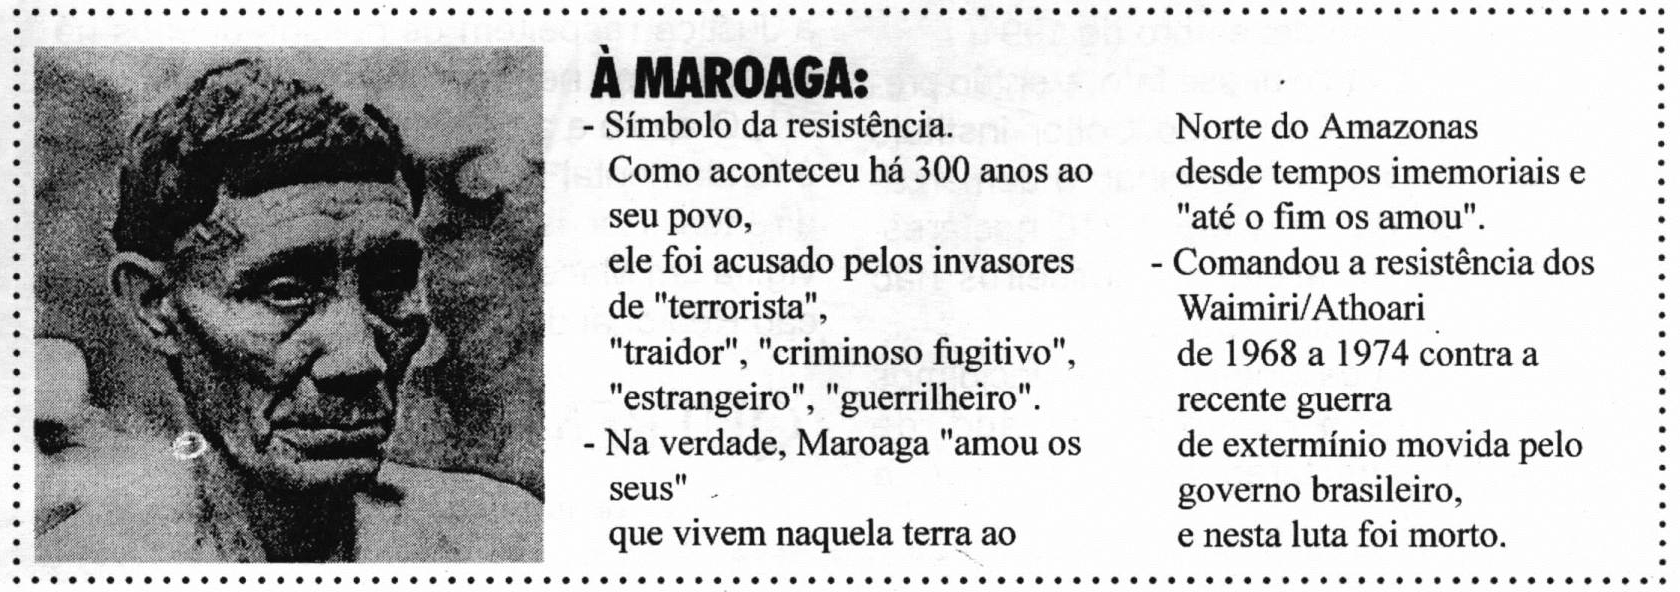 Maroaga